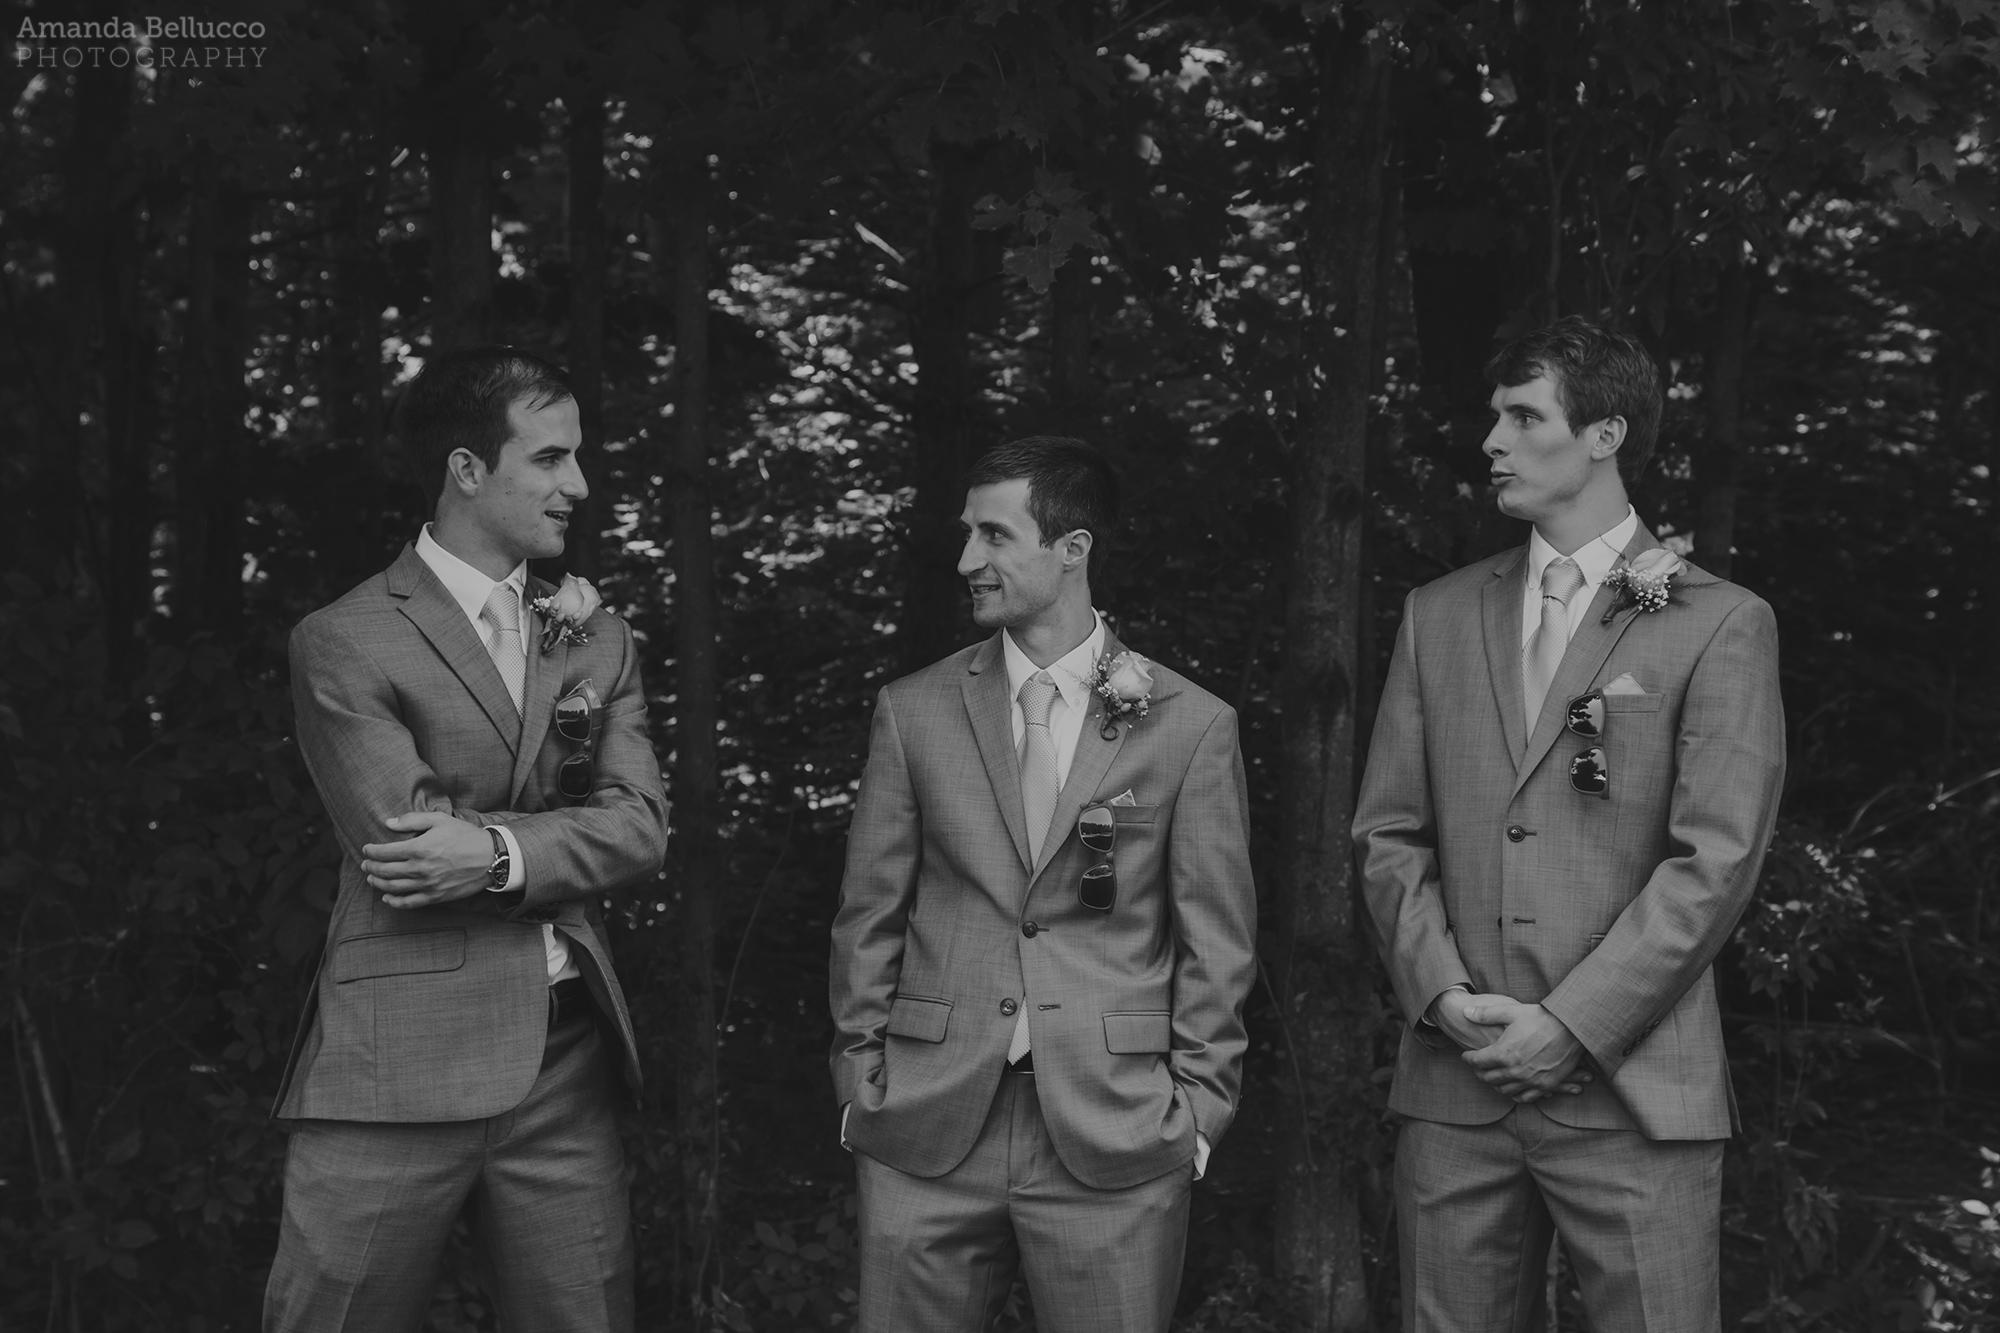 buffalo_ny_wedding_photographer_50.jpg